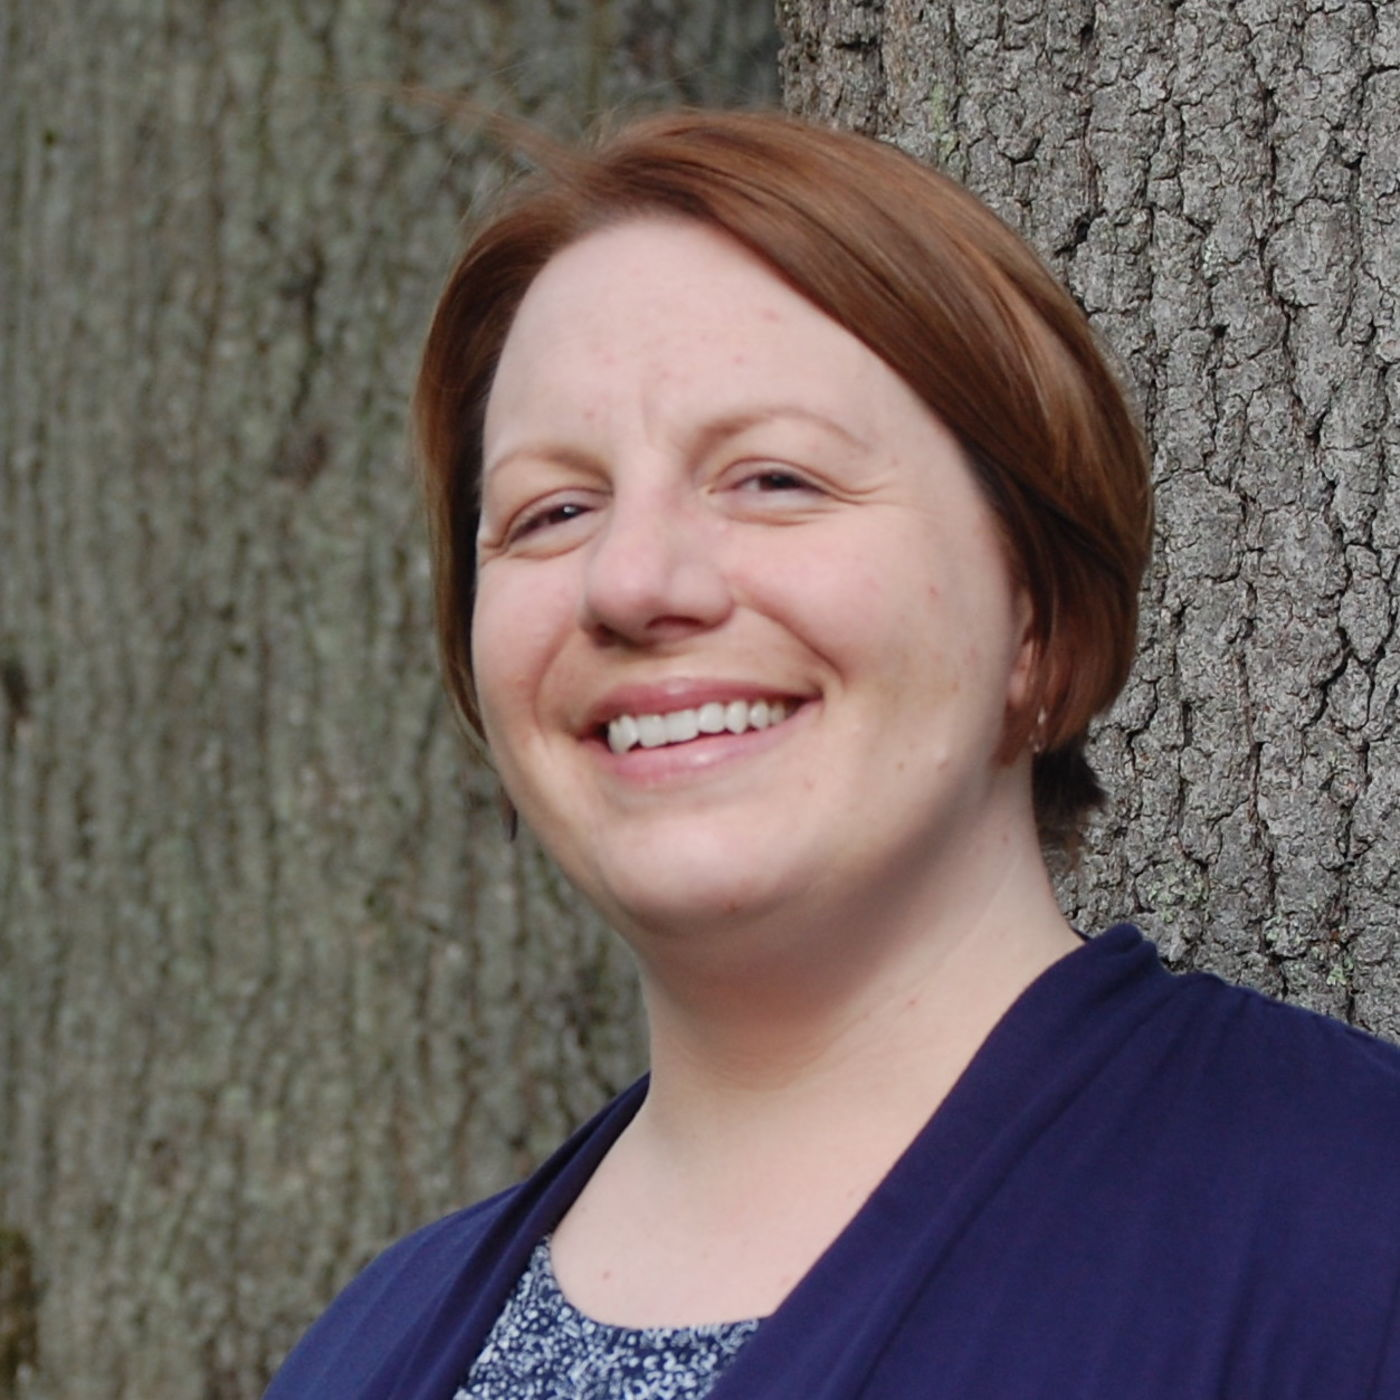 2018 Massachusetts Teacher of the Year: Cara Pekarcik